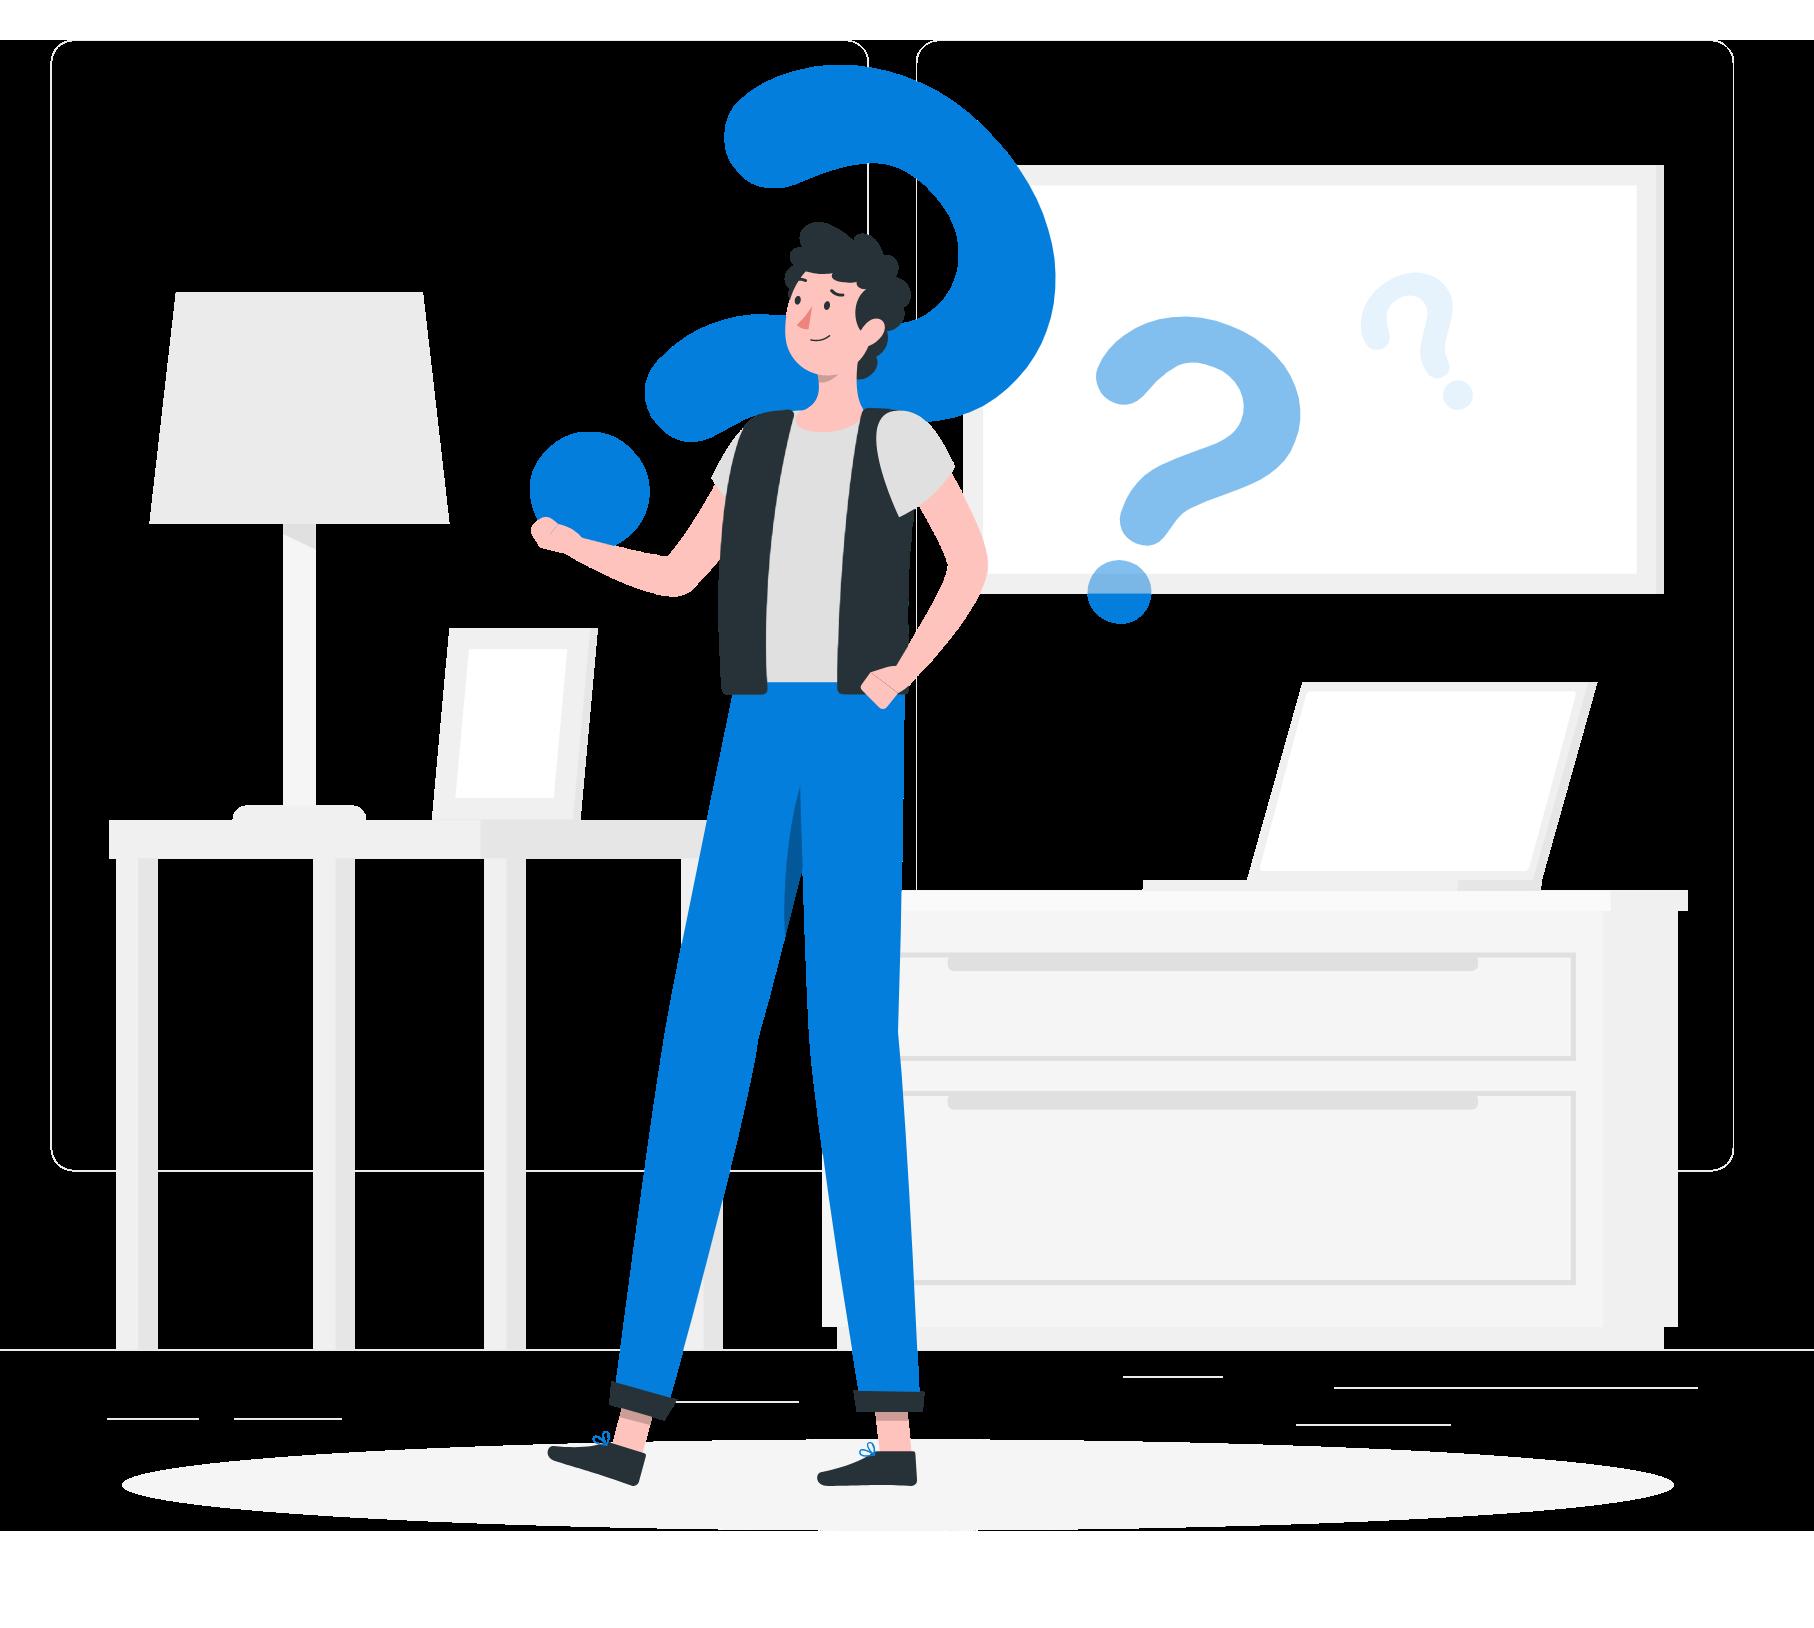 Questions-rafiki.png